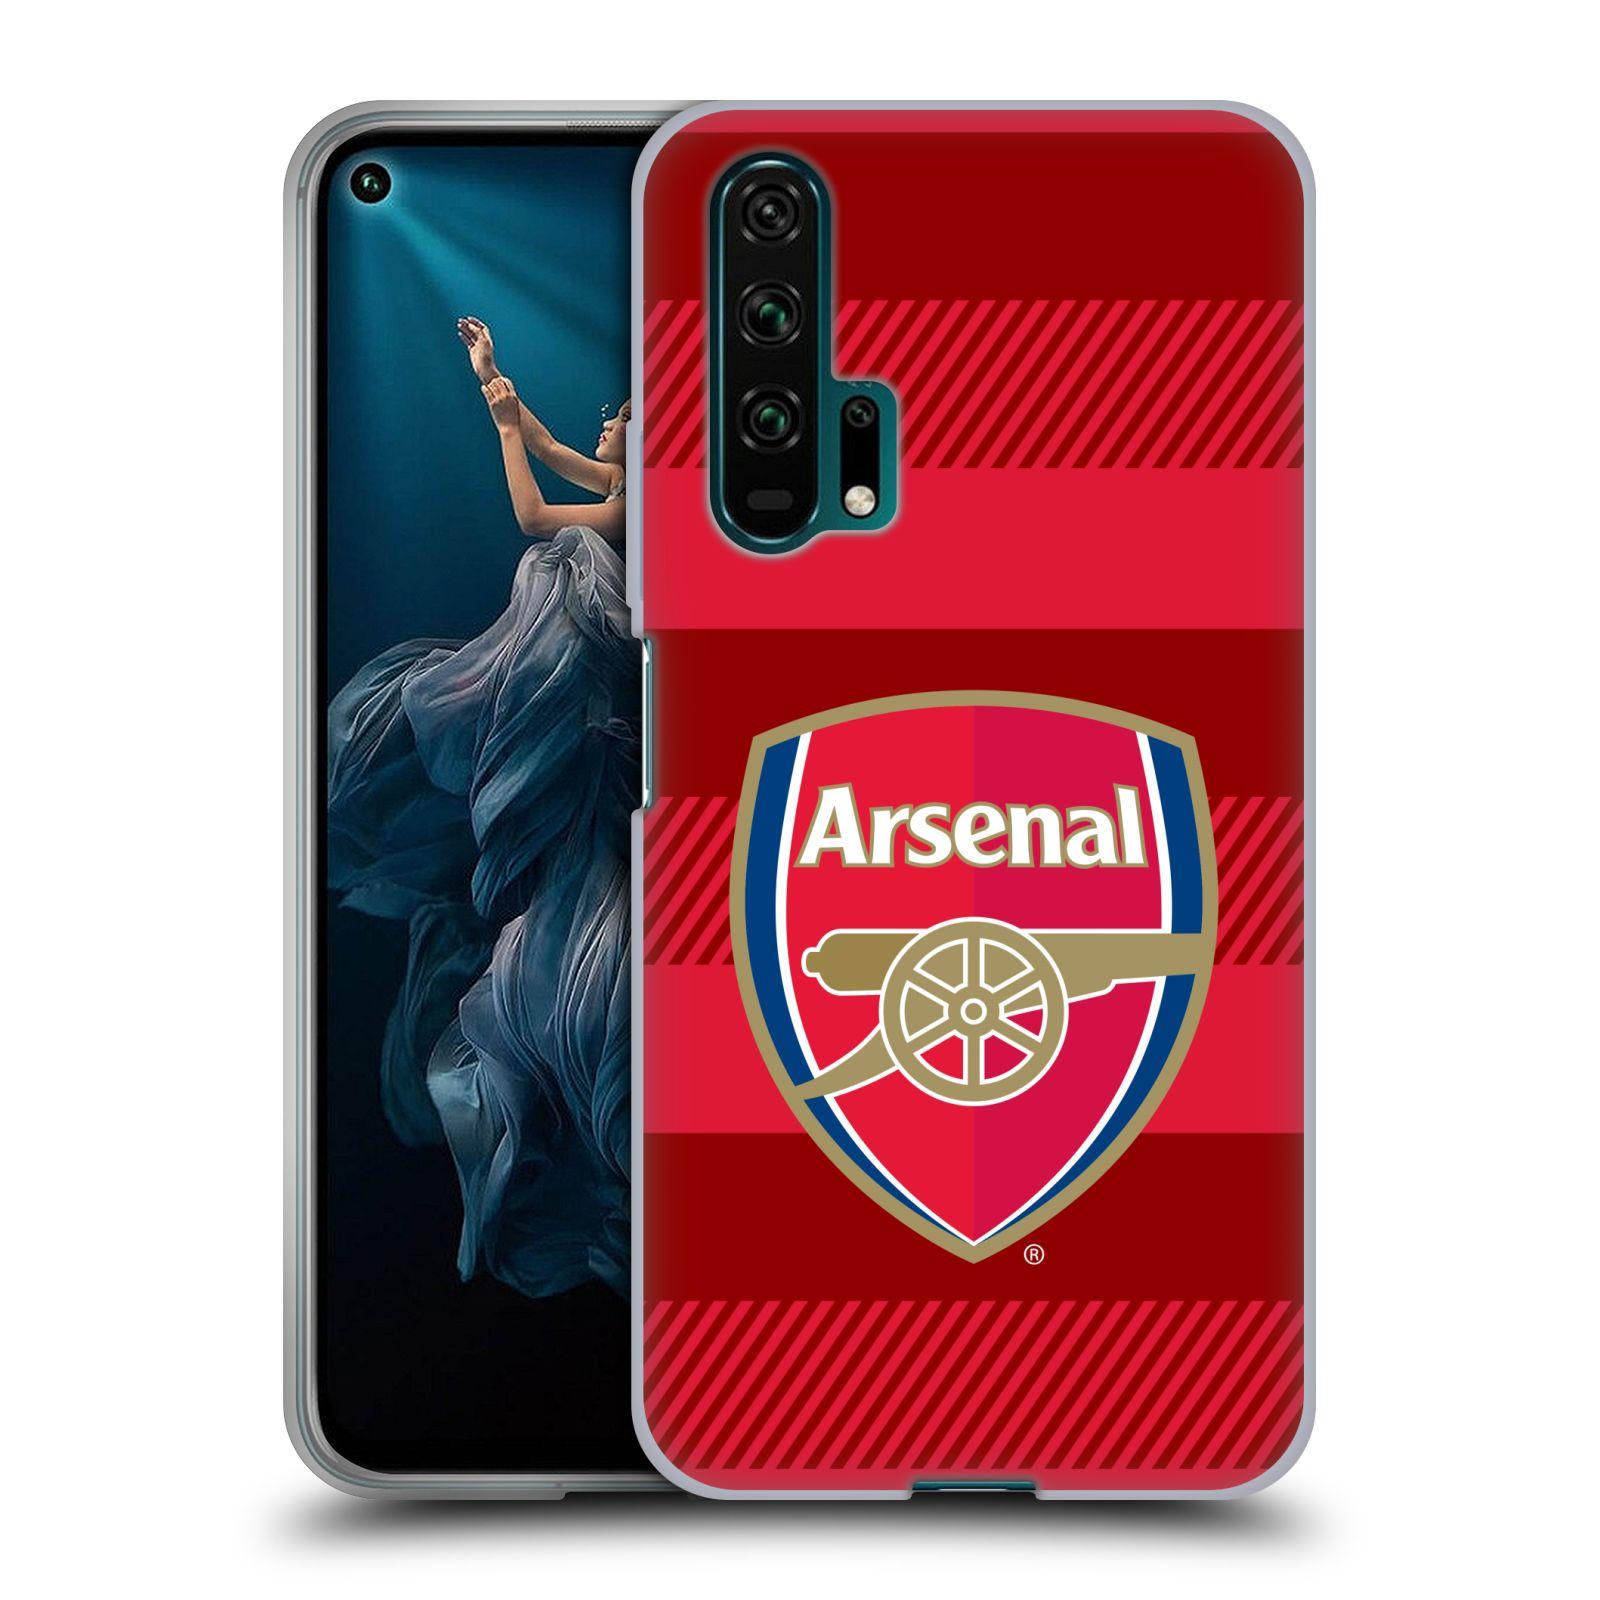 Silikonové pouzdro na mobil Honor 20 Pro - Head Case - Arsenal FC - Logo s pruhy